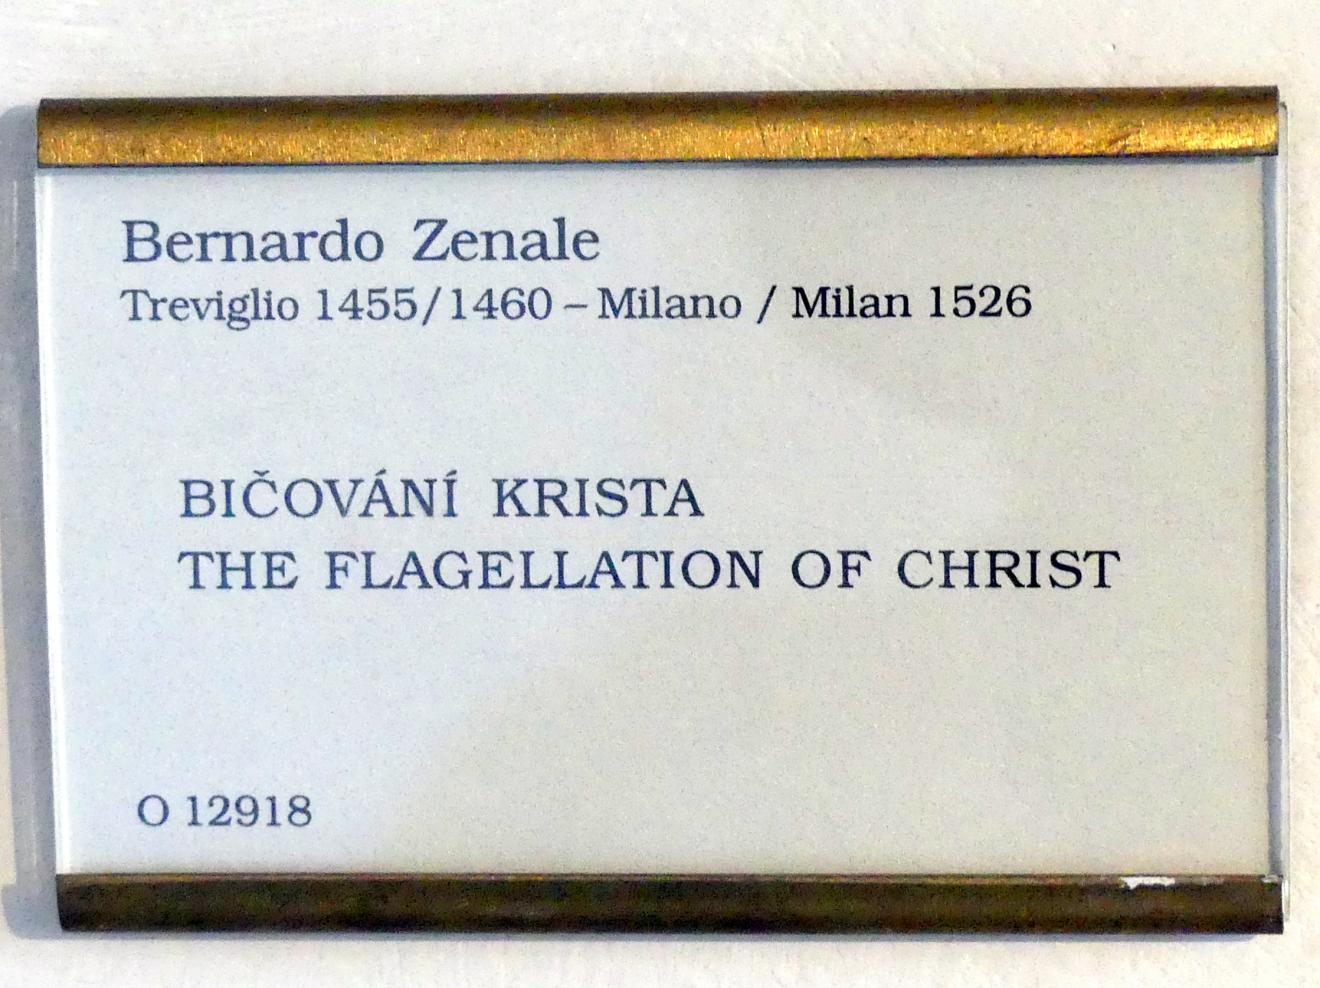 Bernardo Zenale: Geißelung Christi, Undatiert